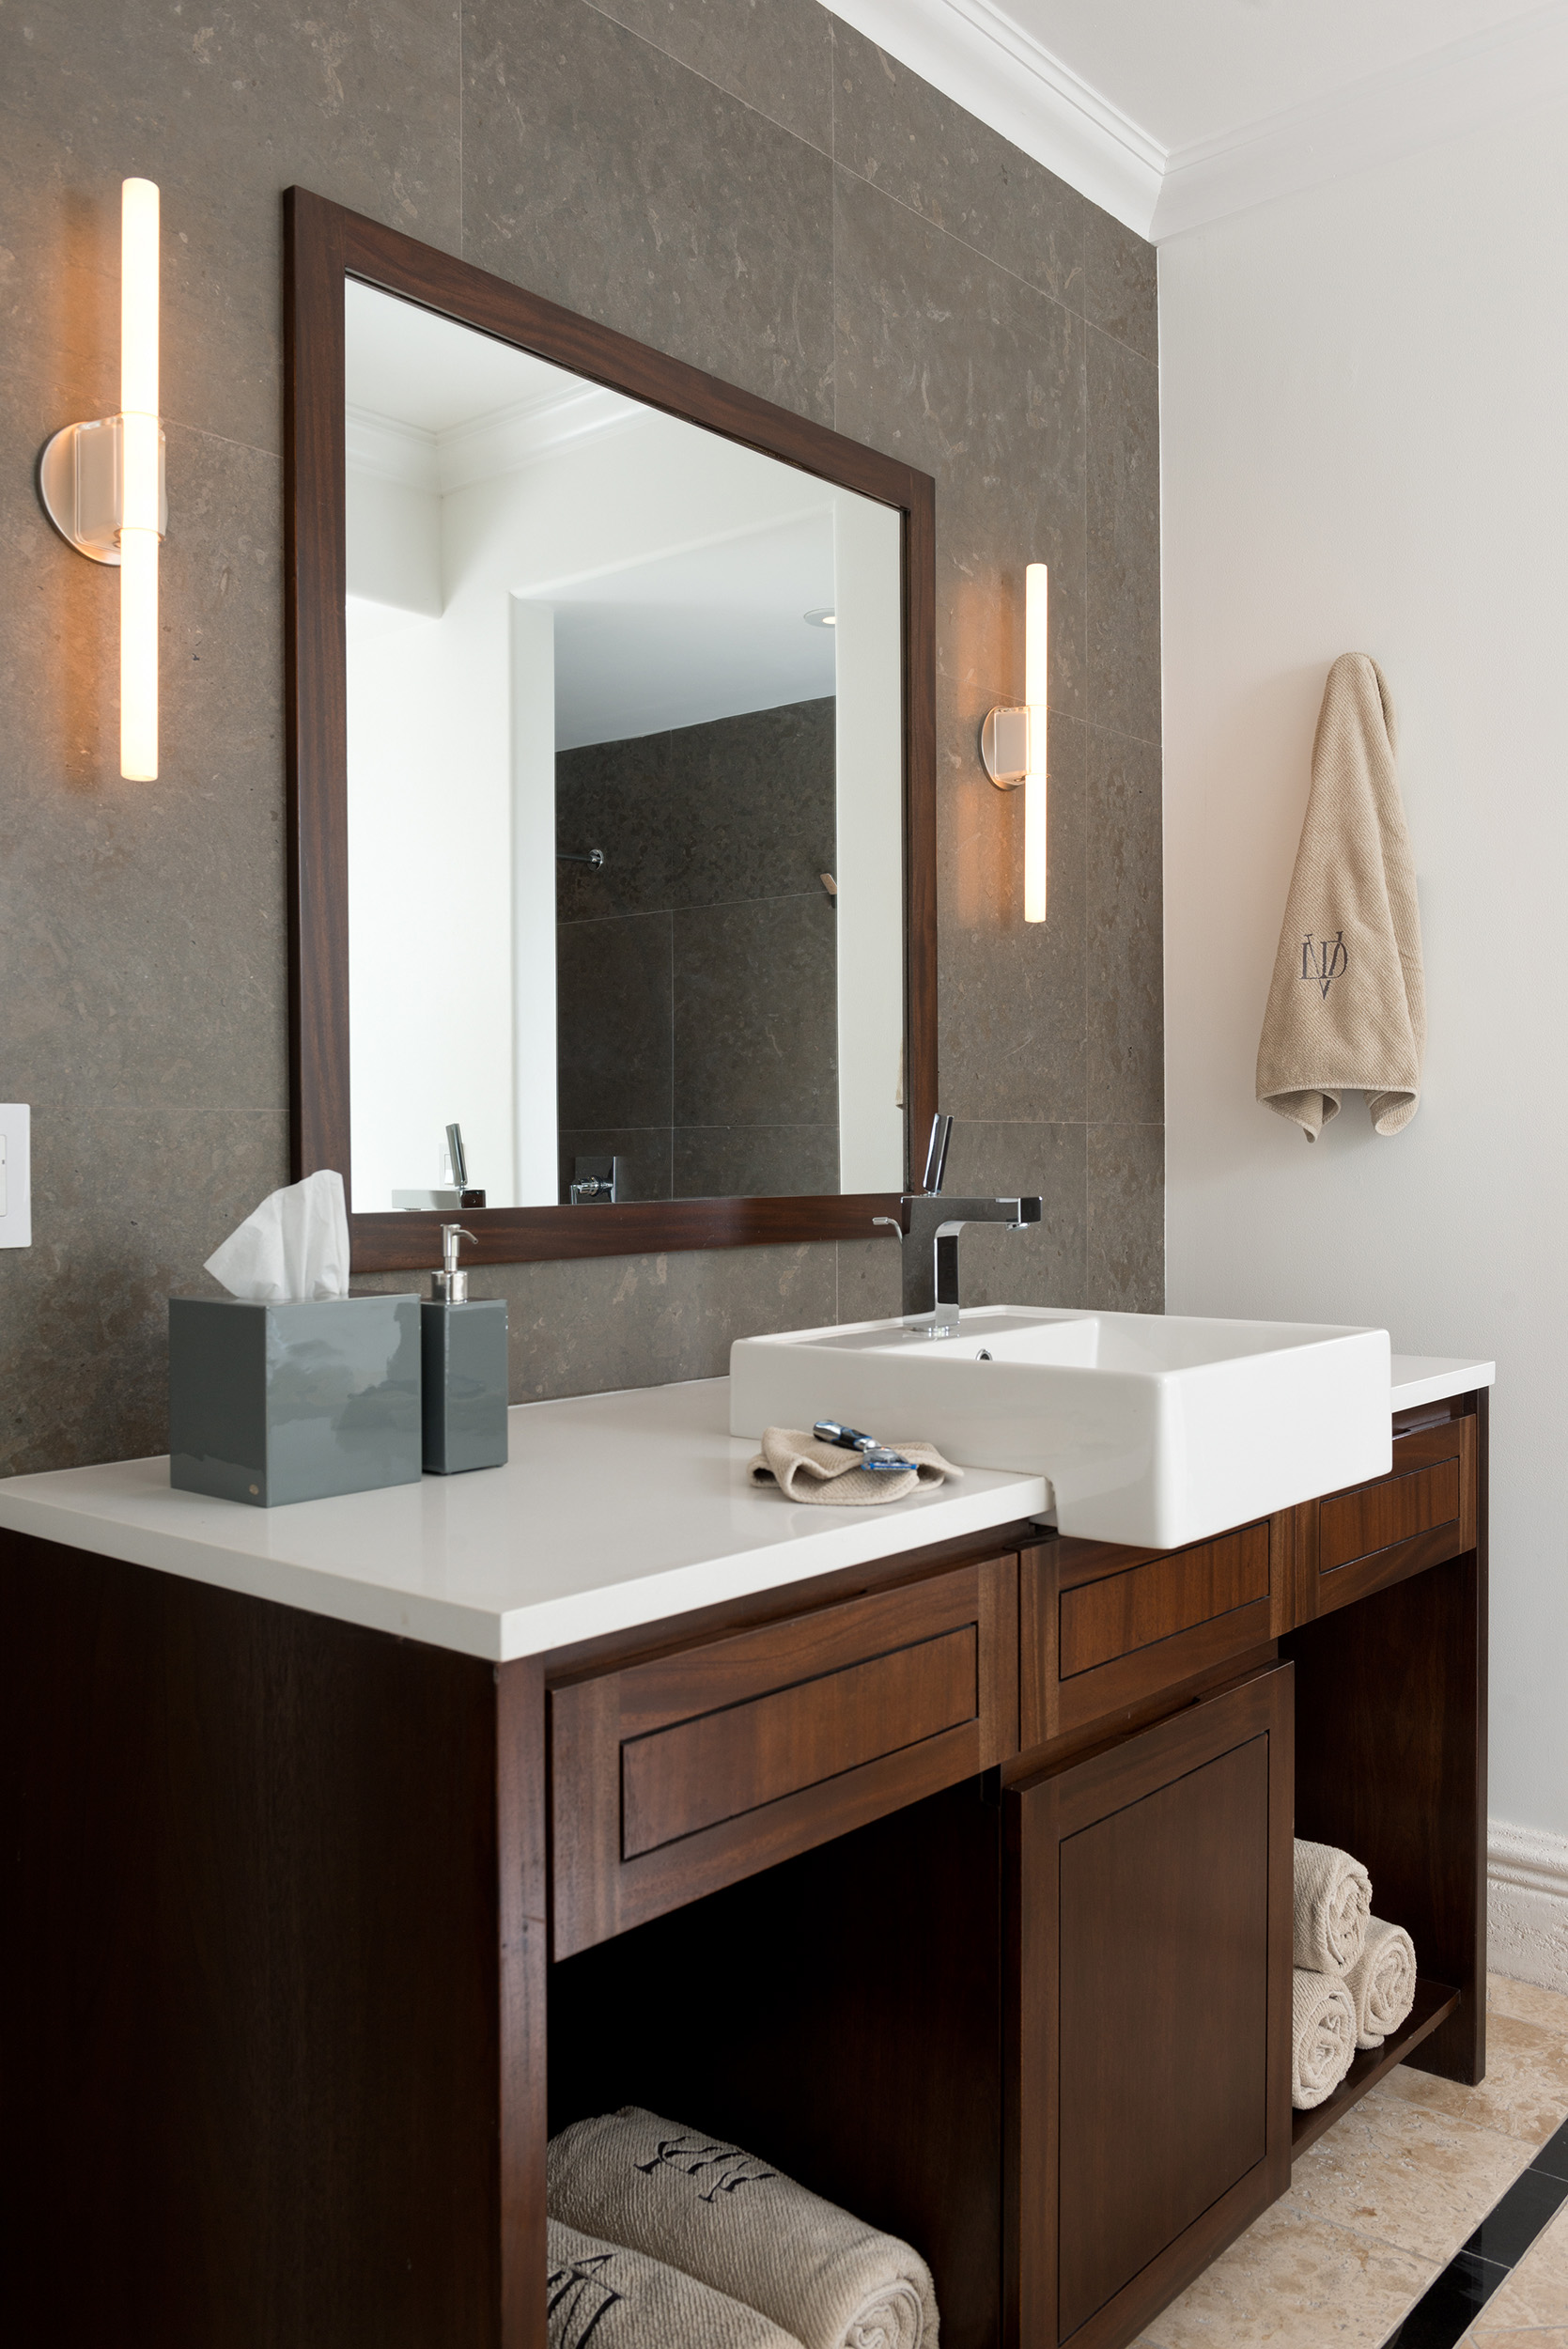 La Dolce Vita - view of a vanity unit